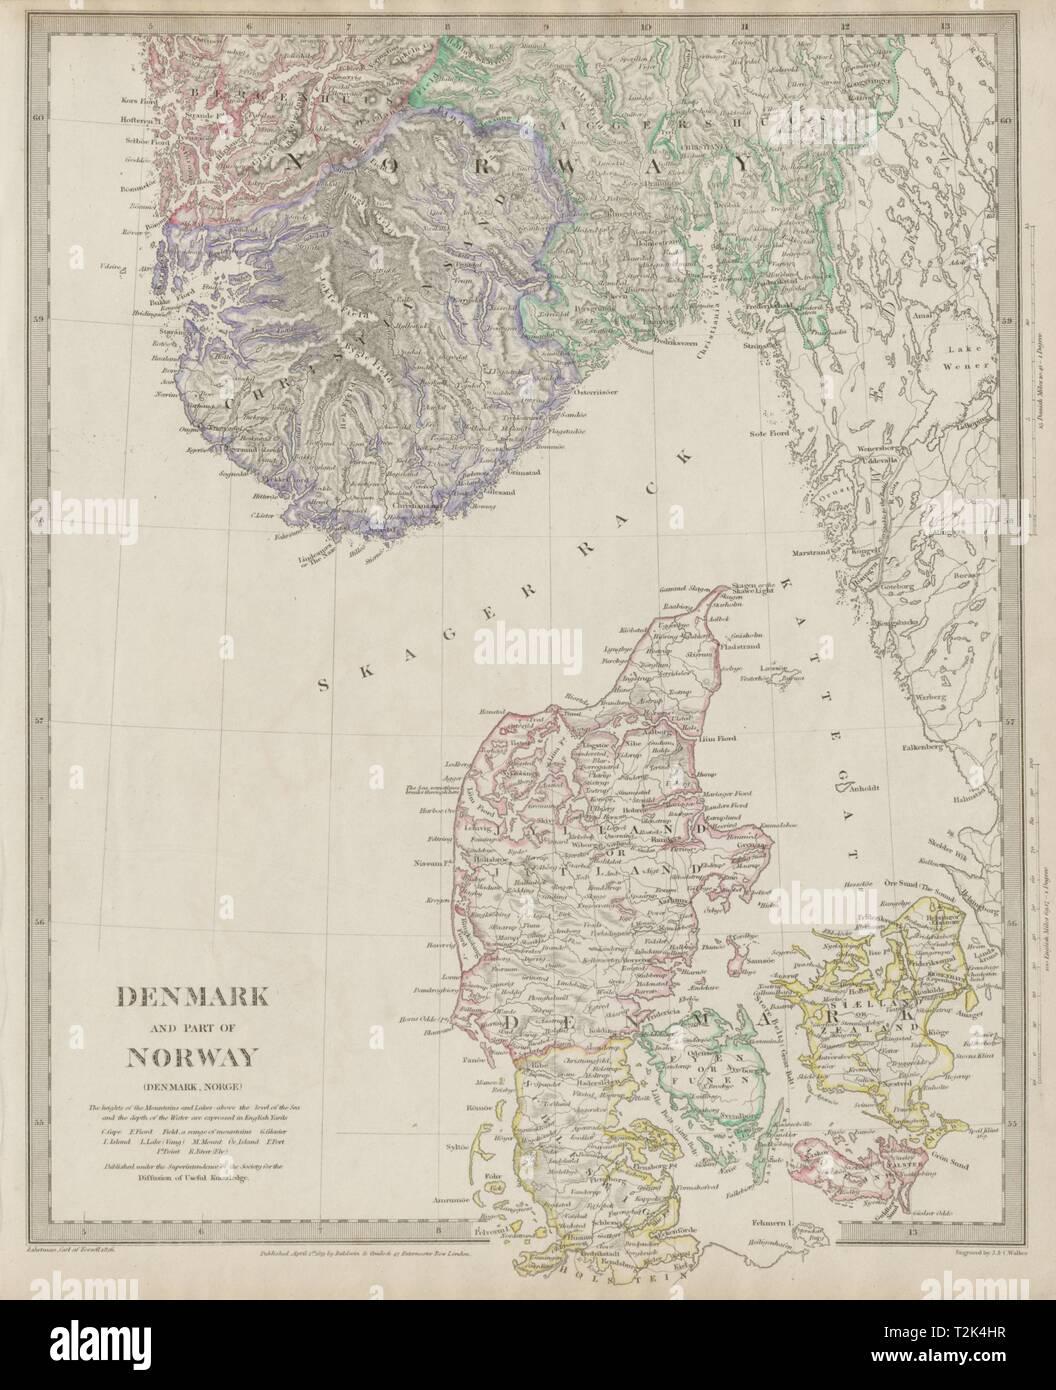 Karte Südnorwegen.Skandinavien Dänemark Und Südnorwegen Norge Sduk 1844 Alte